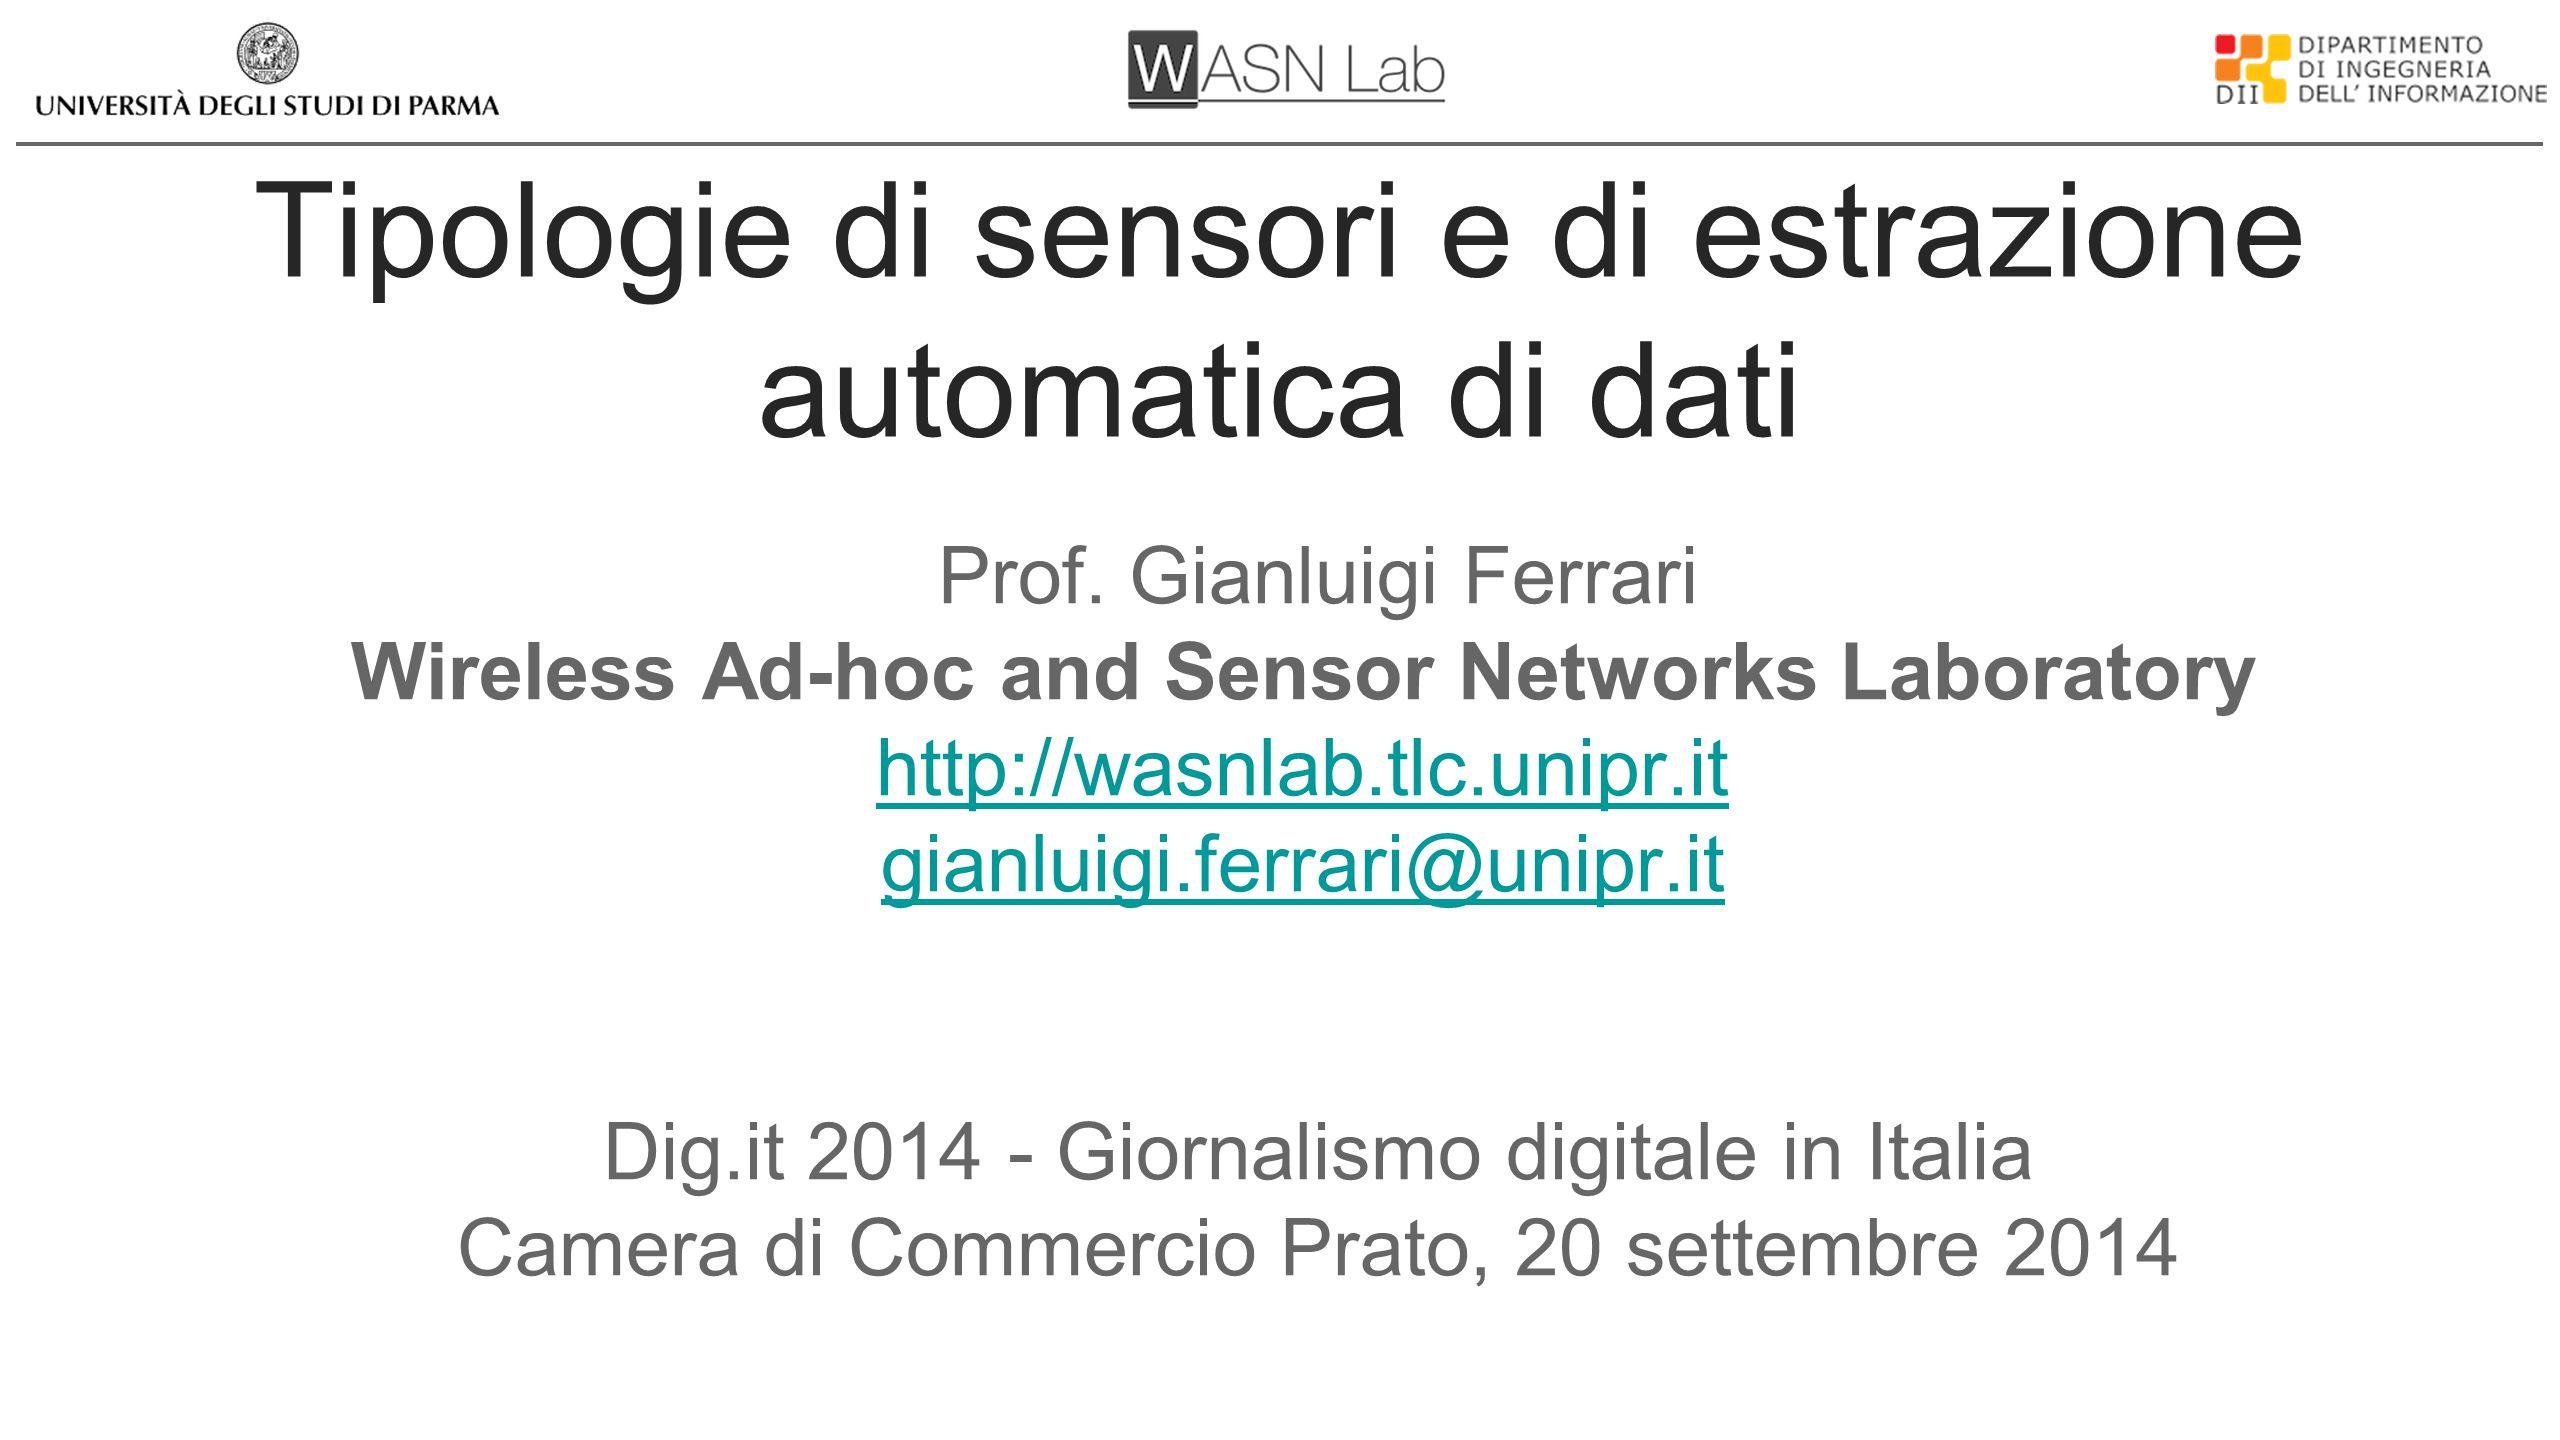 WASN Lab Wireless Ad-hoc and Sensor Networks Laboratory Prof.